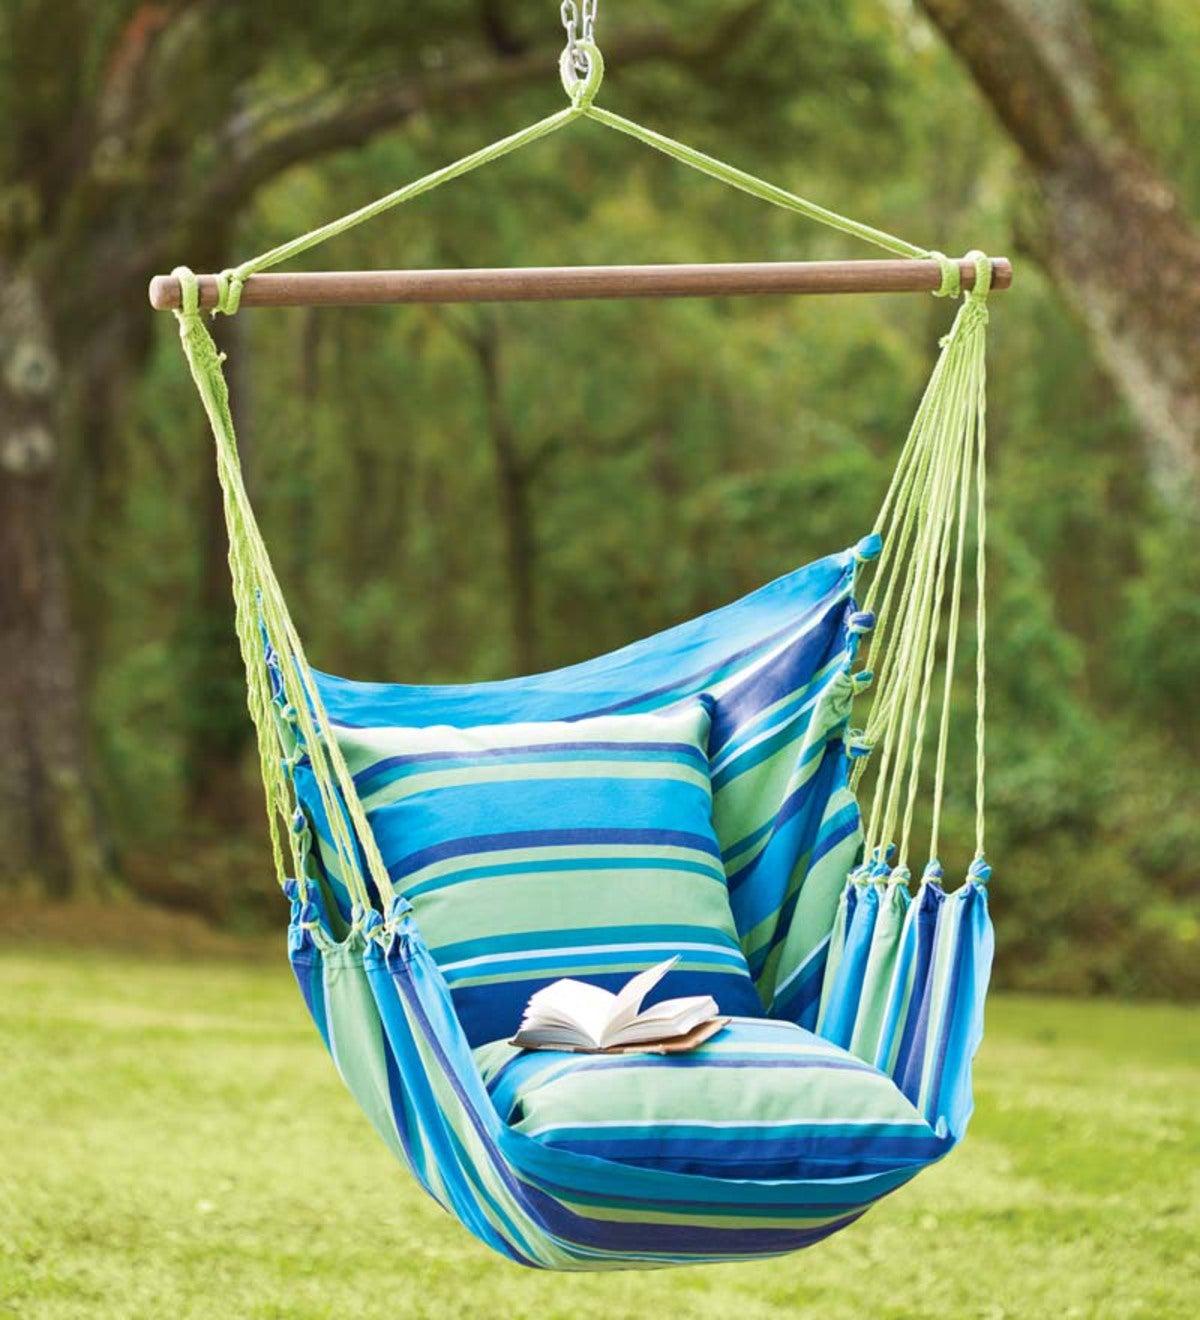 Blue Striped Cotton Hammock Chair Swing Plowhearth